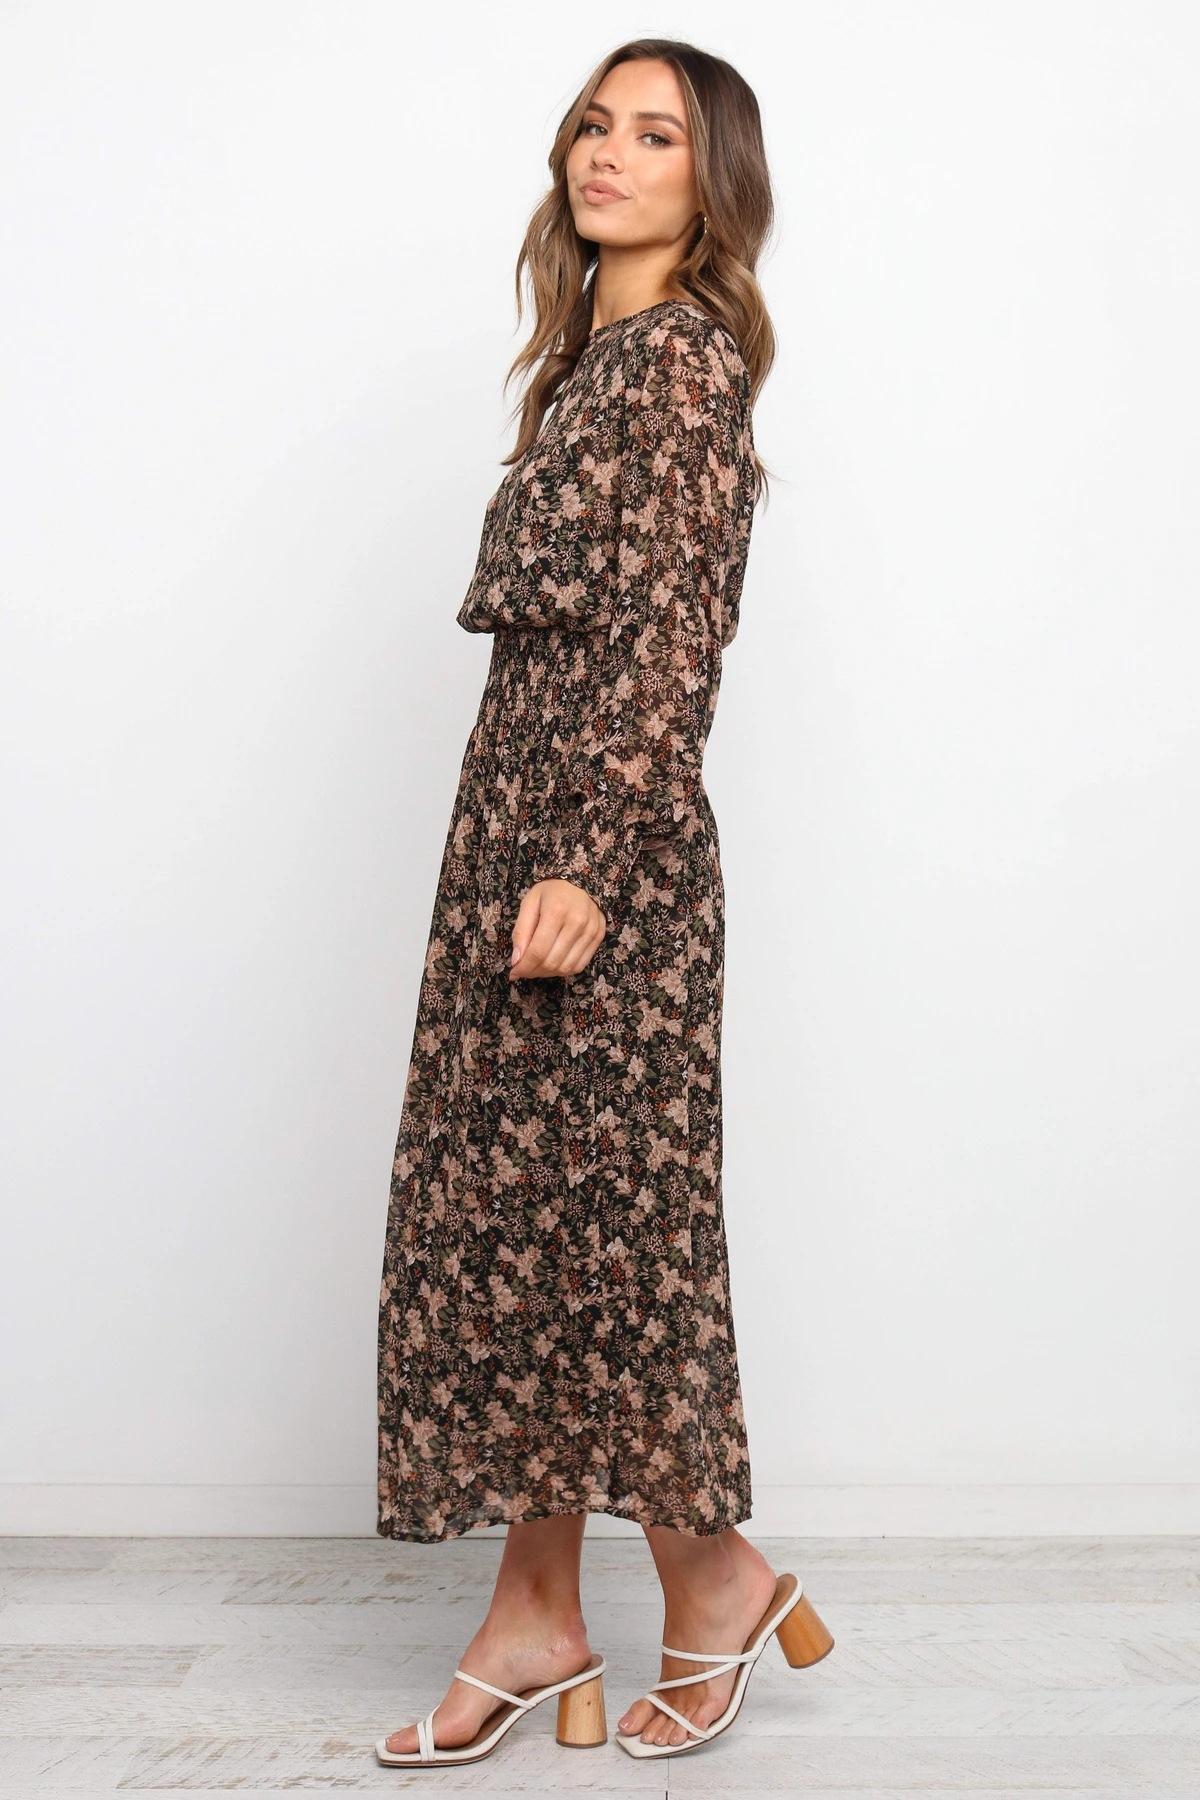 New Long Sleeve Printed Chiffon Dress Slim Fit Long Dress NSYD3810